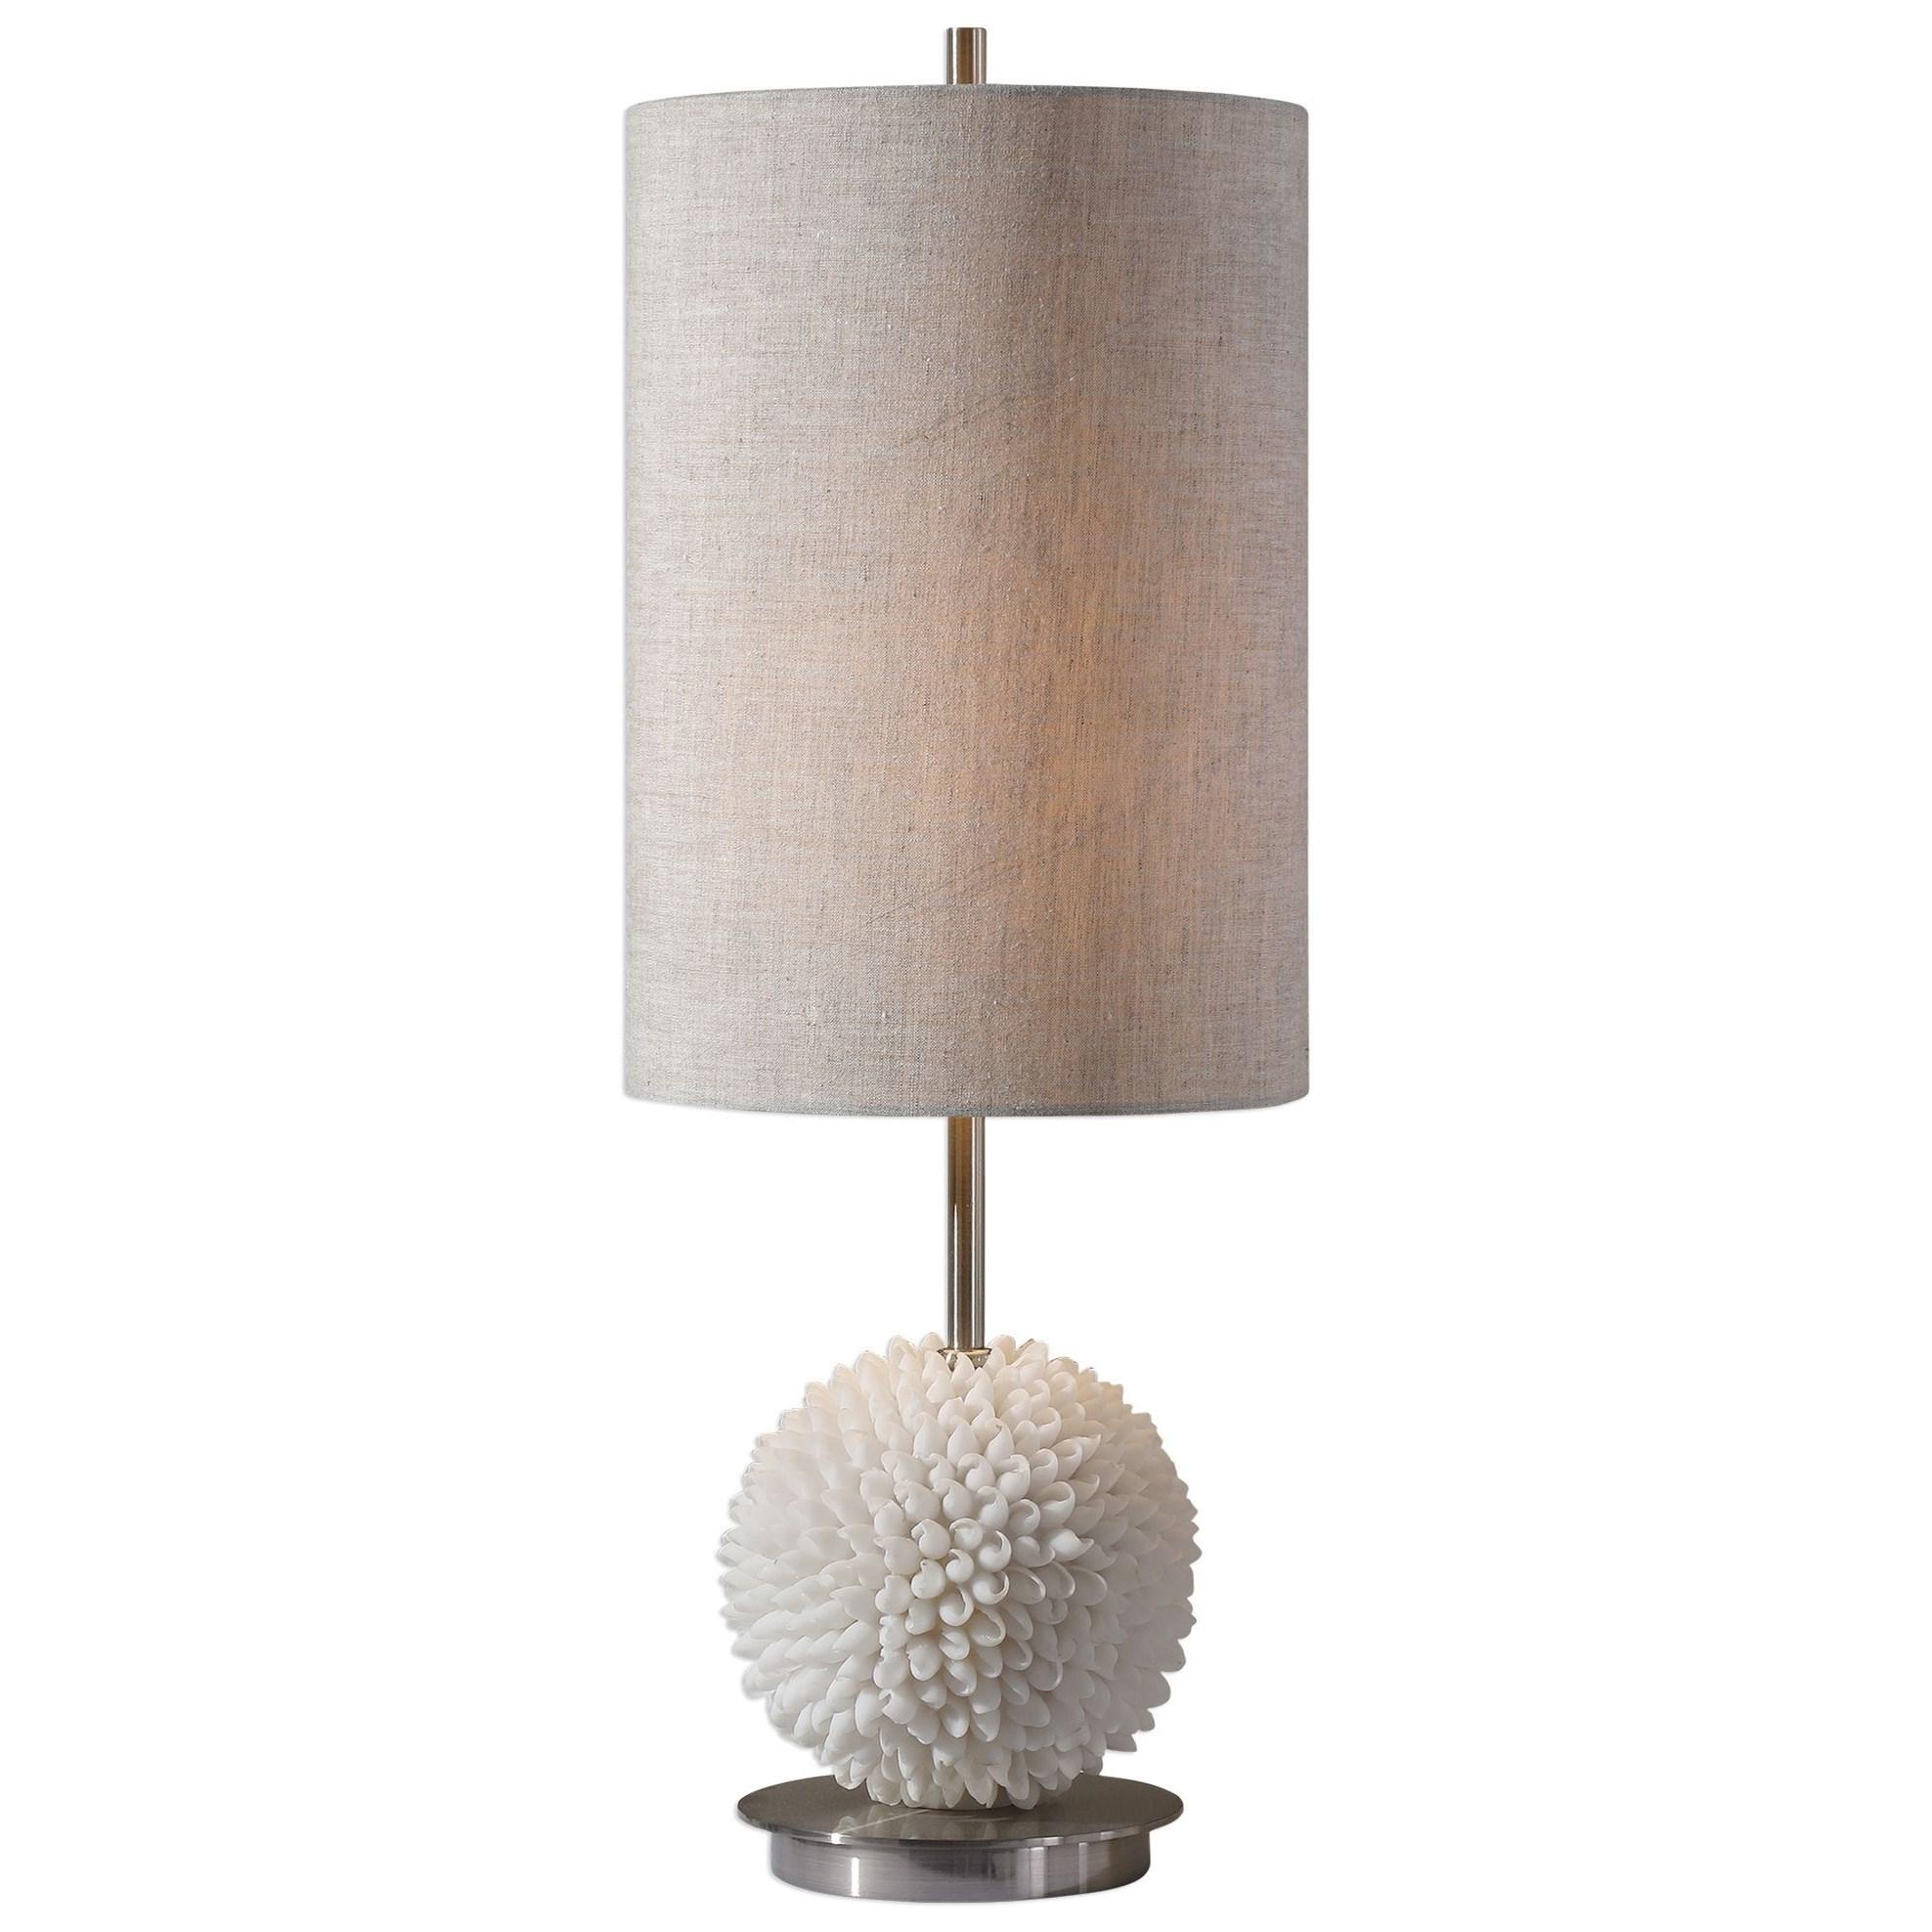 Buffet Lamps Cascara Sea Shells Lamp by Uttermost at Suburban Furniture